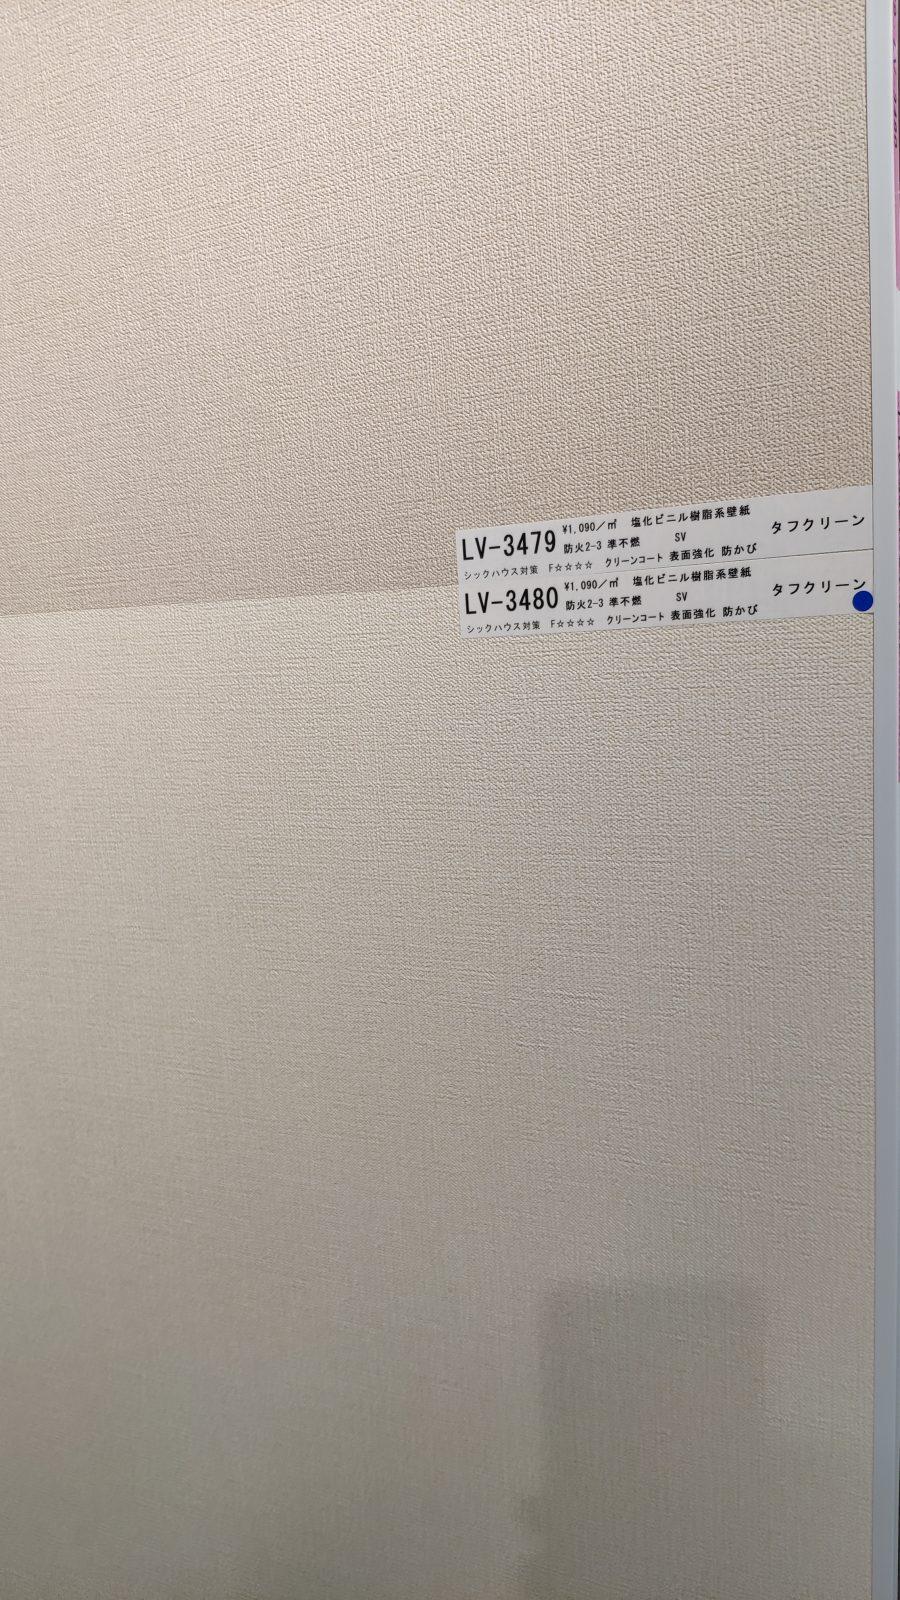 LV-3479 / LV-3480(LTS428)